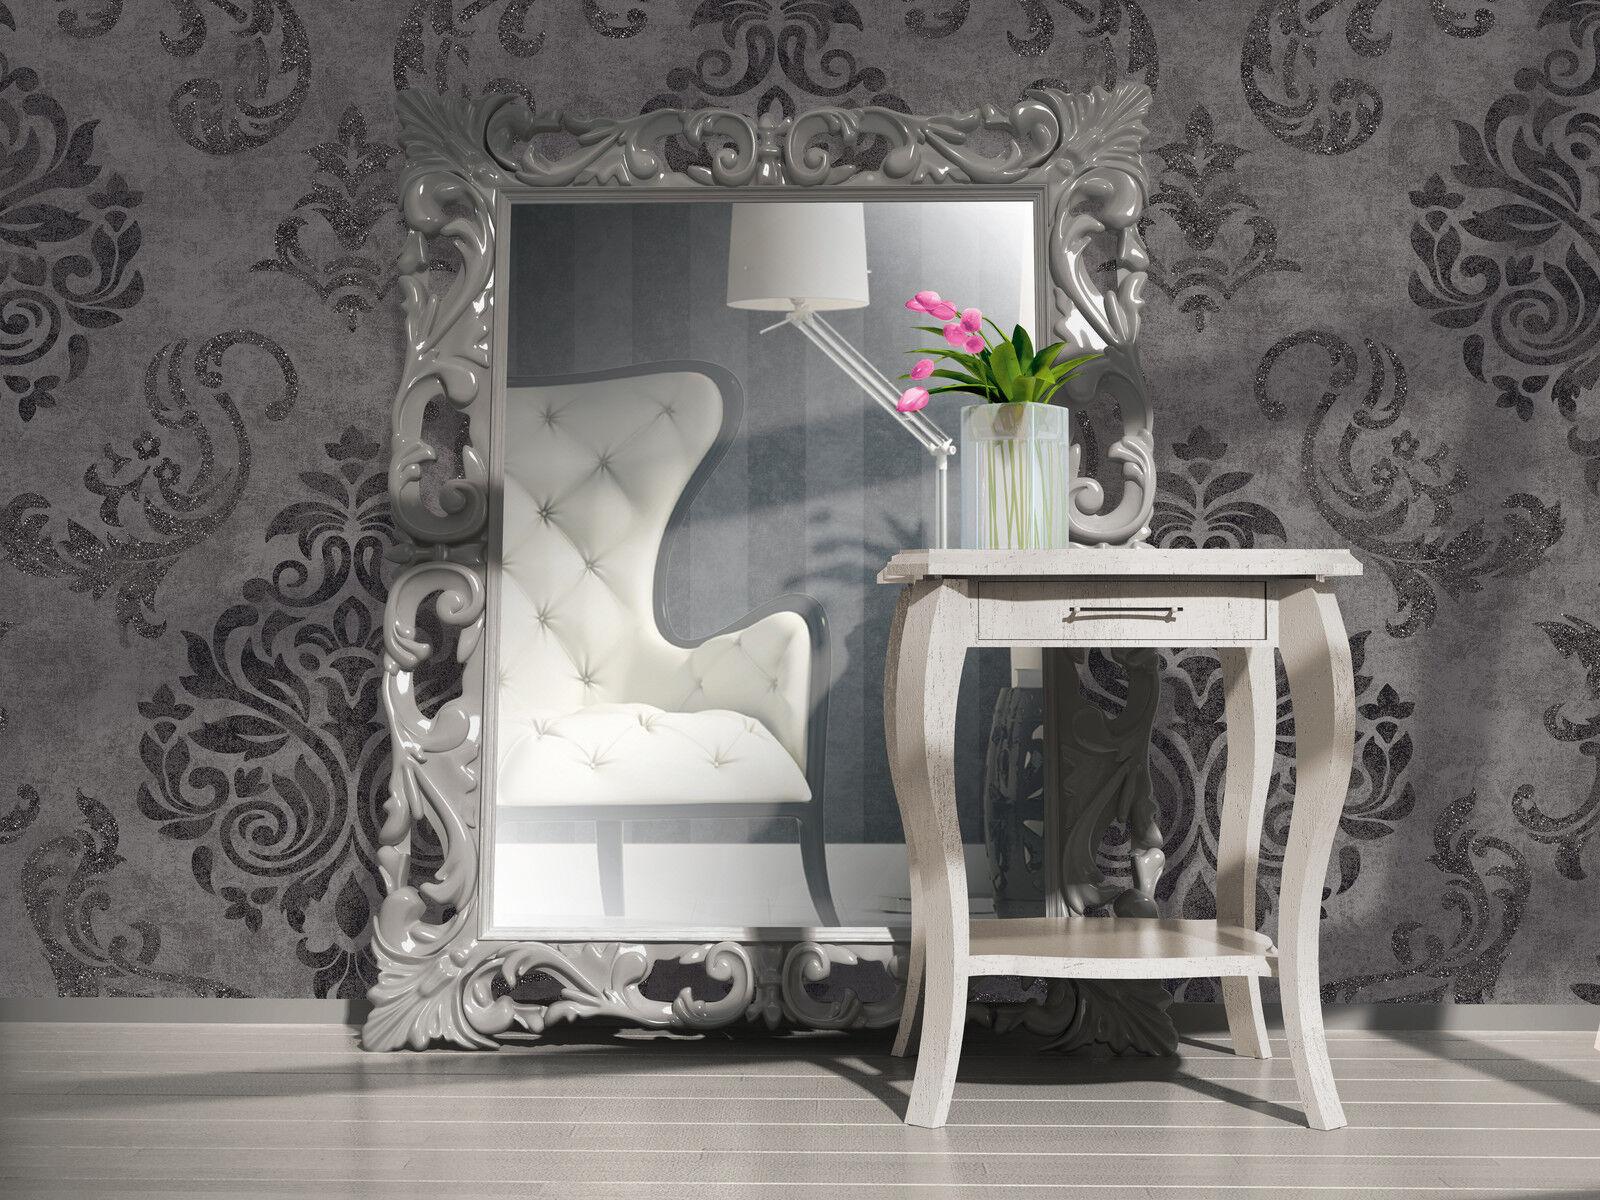 vlies tapete barock muster ornament anthrazit grau silber. Black Bedroom Furniture Sets. Home Design Ideas